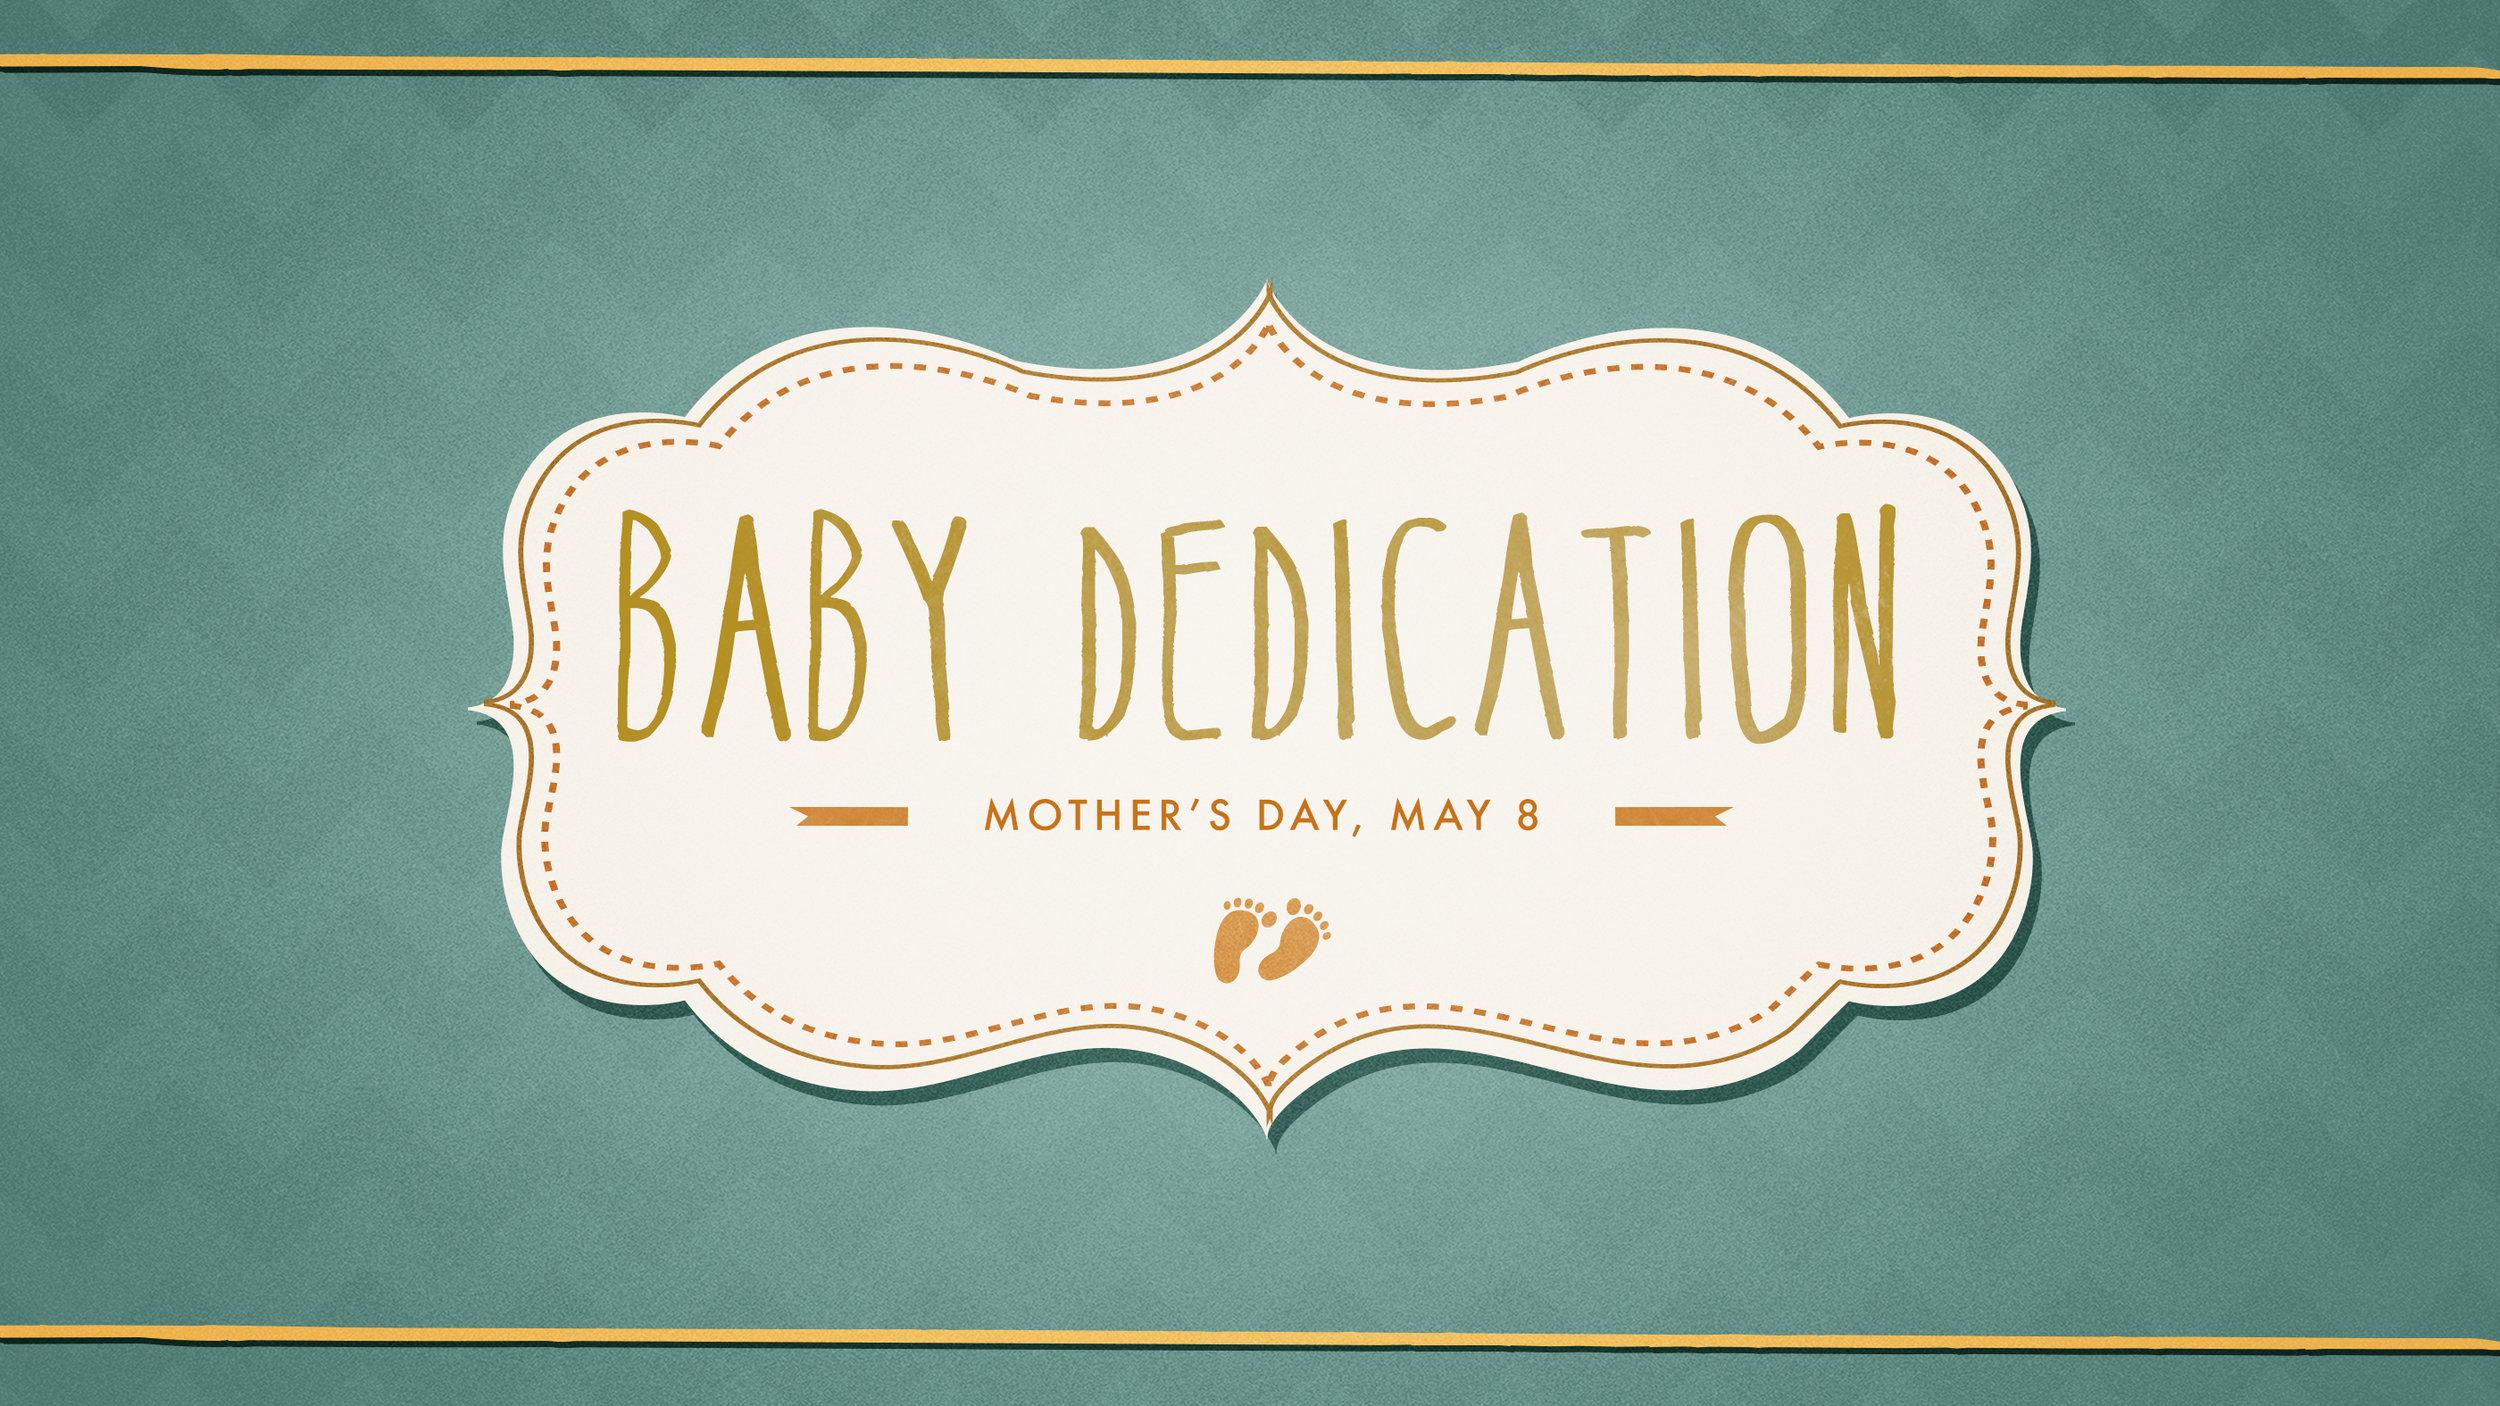 Baby-Dedication-Mothers-Day.jpg